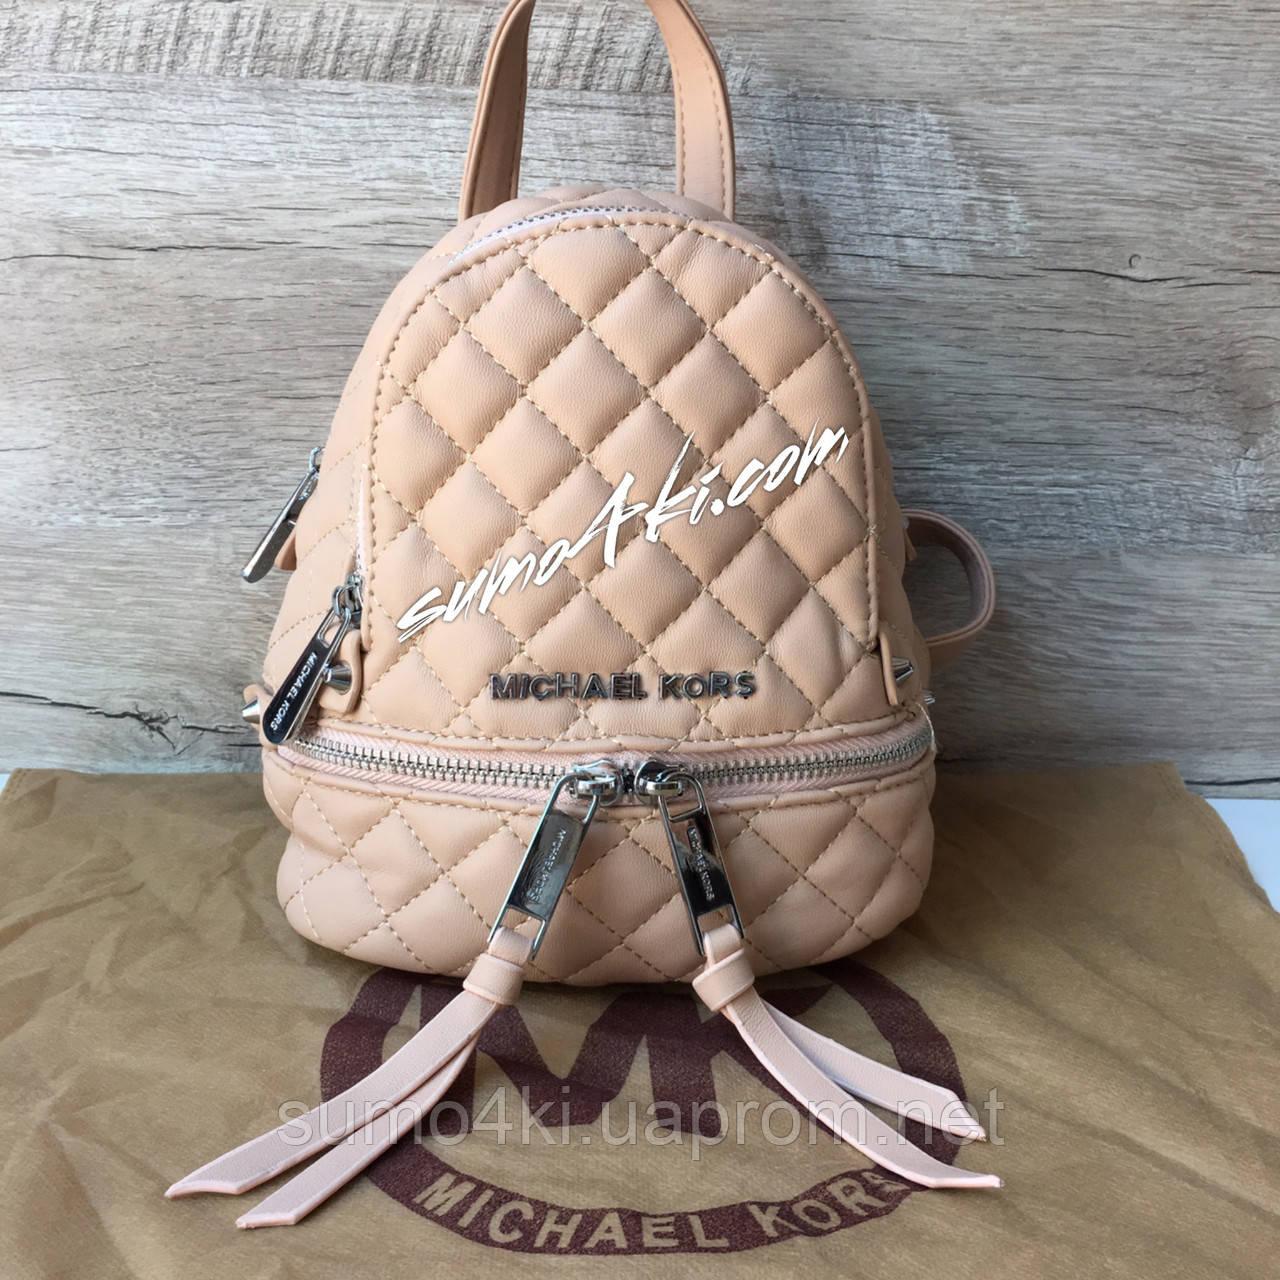 Купить Женский маленький рюкзак Michael Kors mini Майкла Корс мини ... 16128ea6ac6